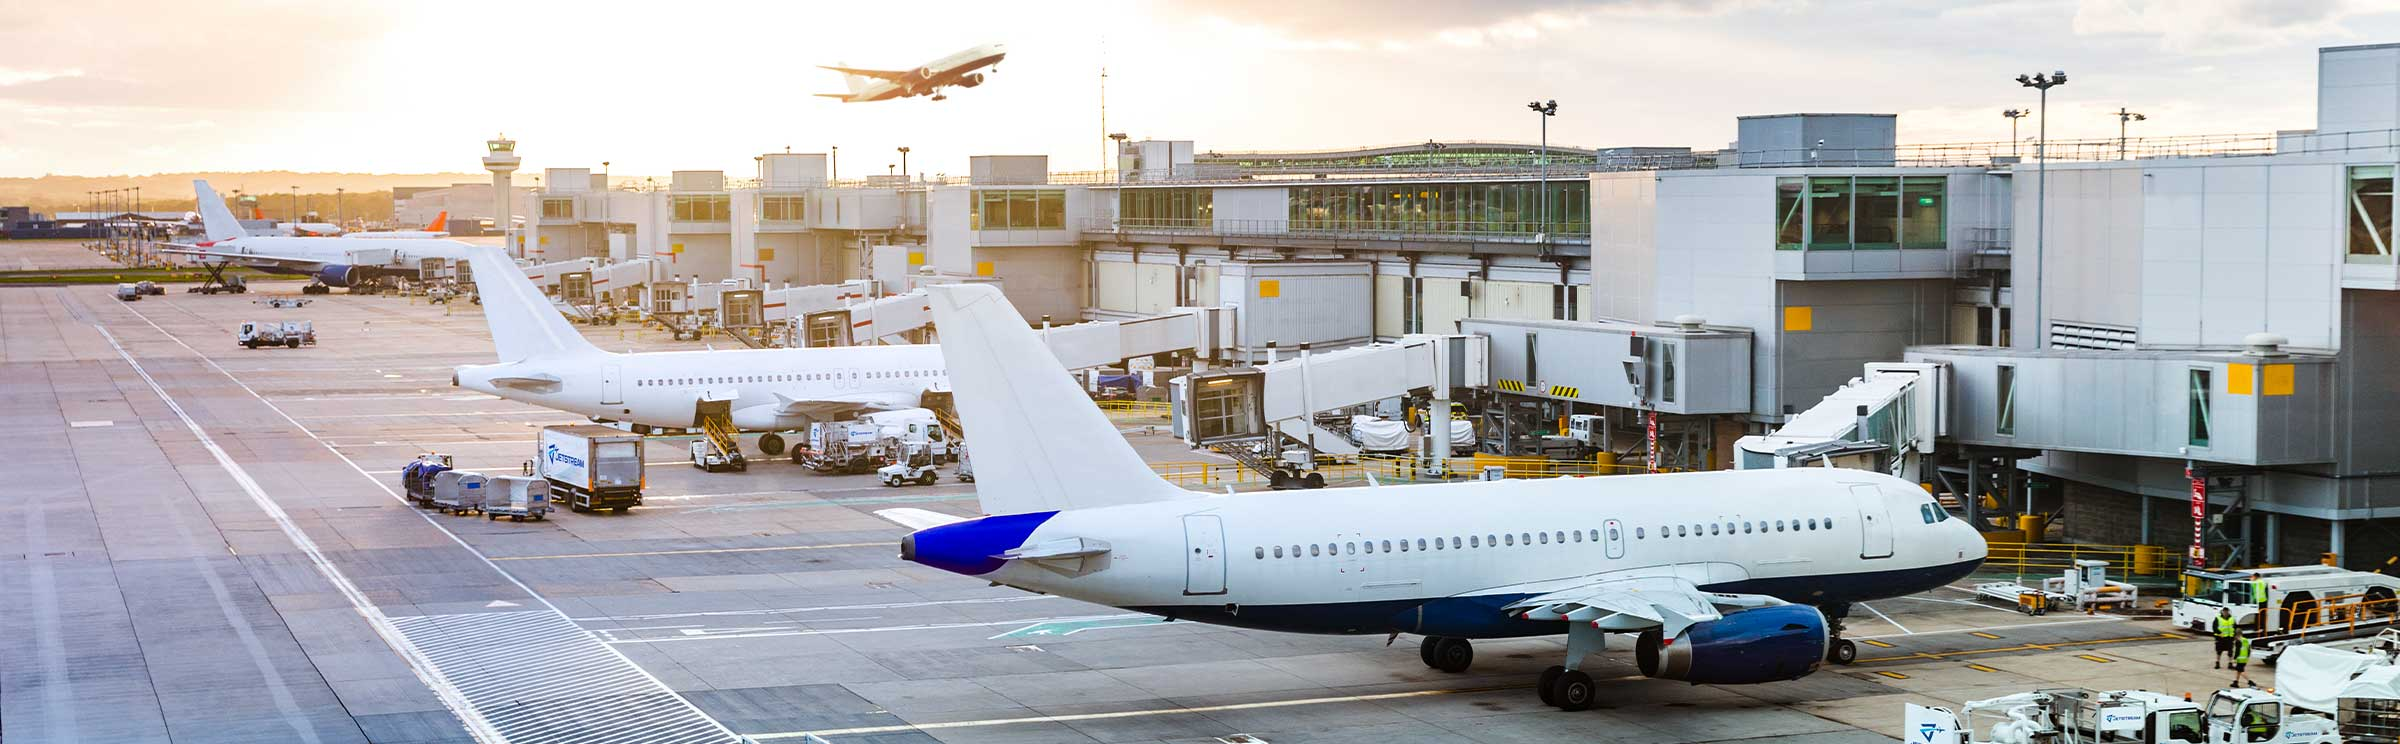 Jetstream Ground Services locations across America